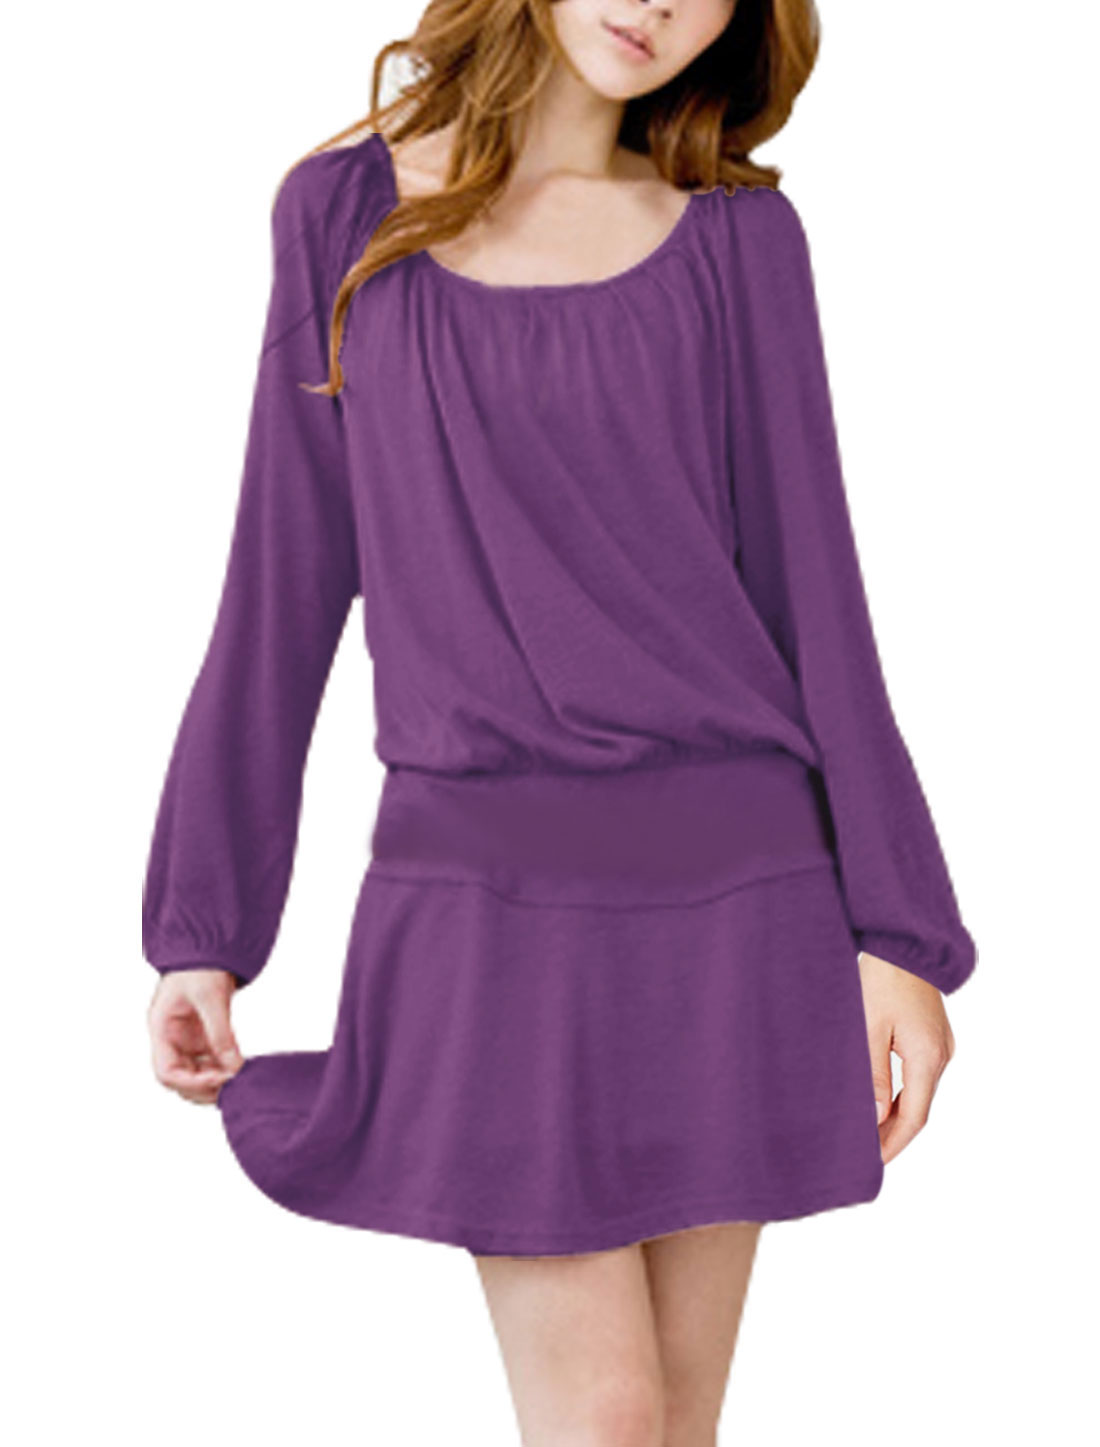 Women Stretchy Waist Raglan Design Sweet Dress w Belt Dark Purple M